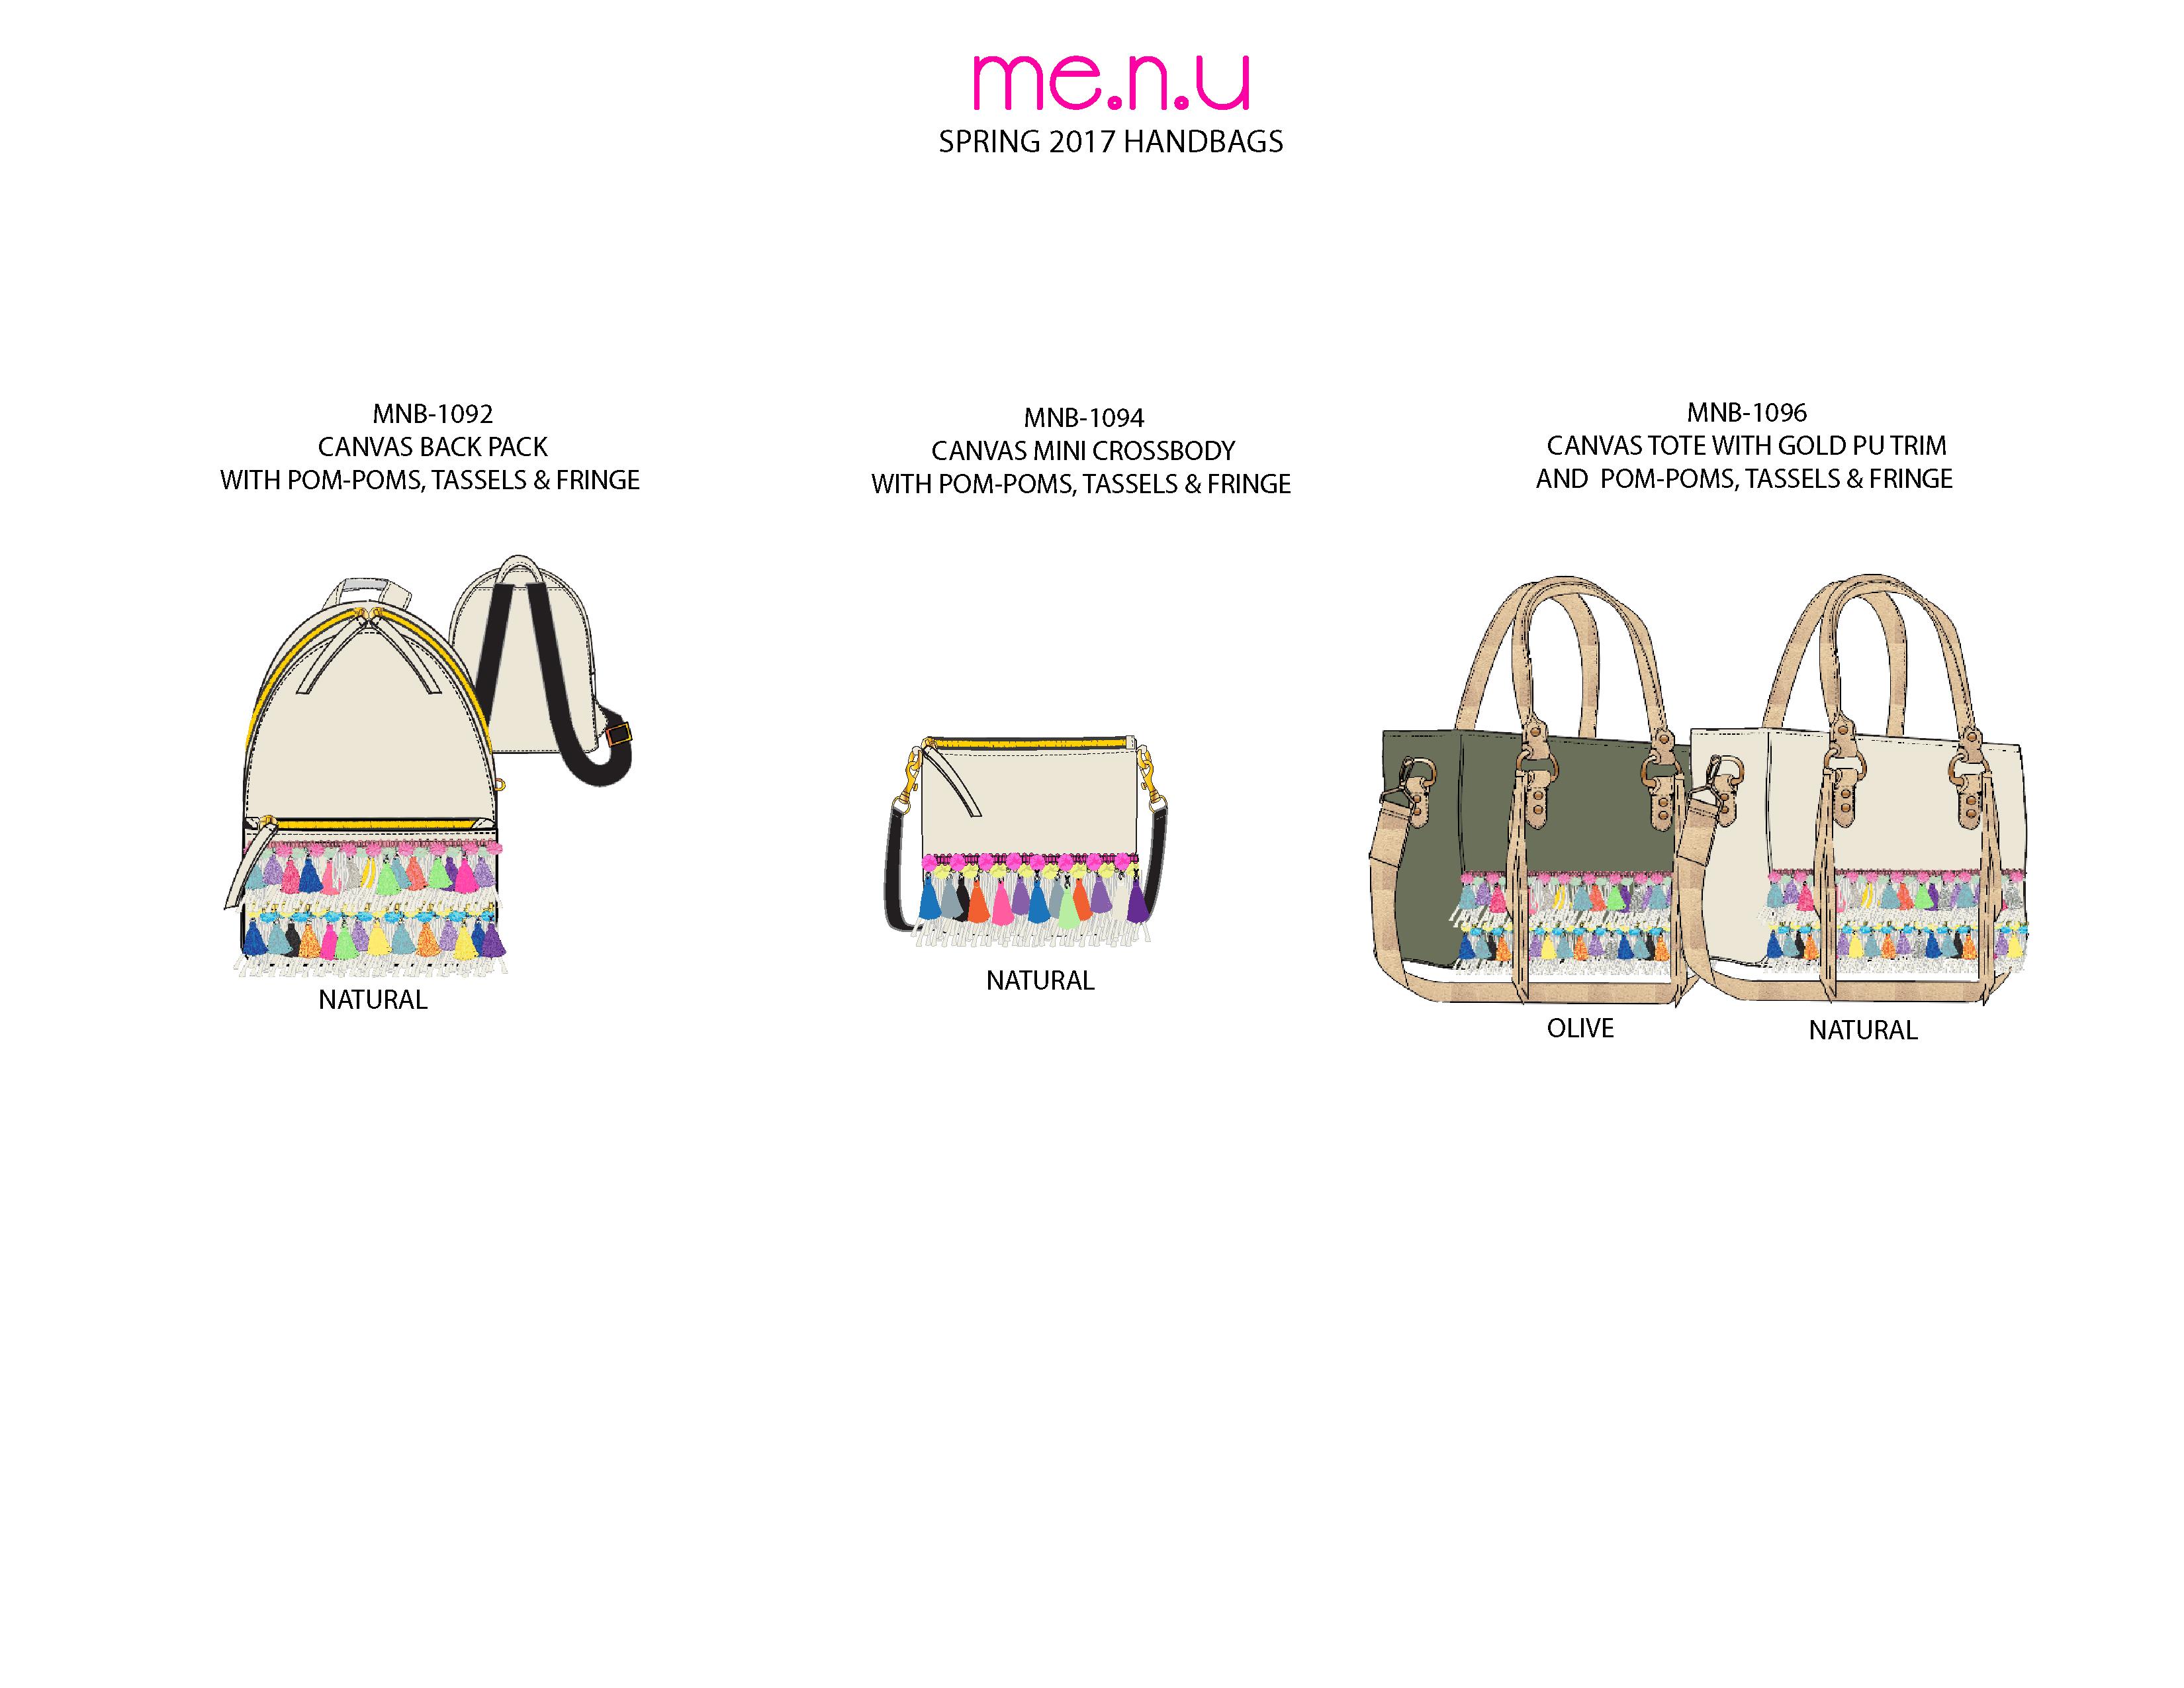 Me.n.u Spr '17 Handbags